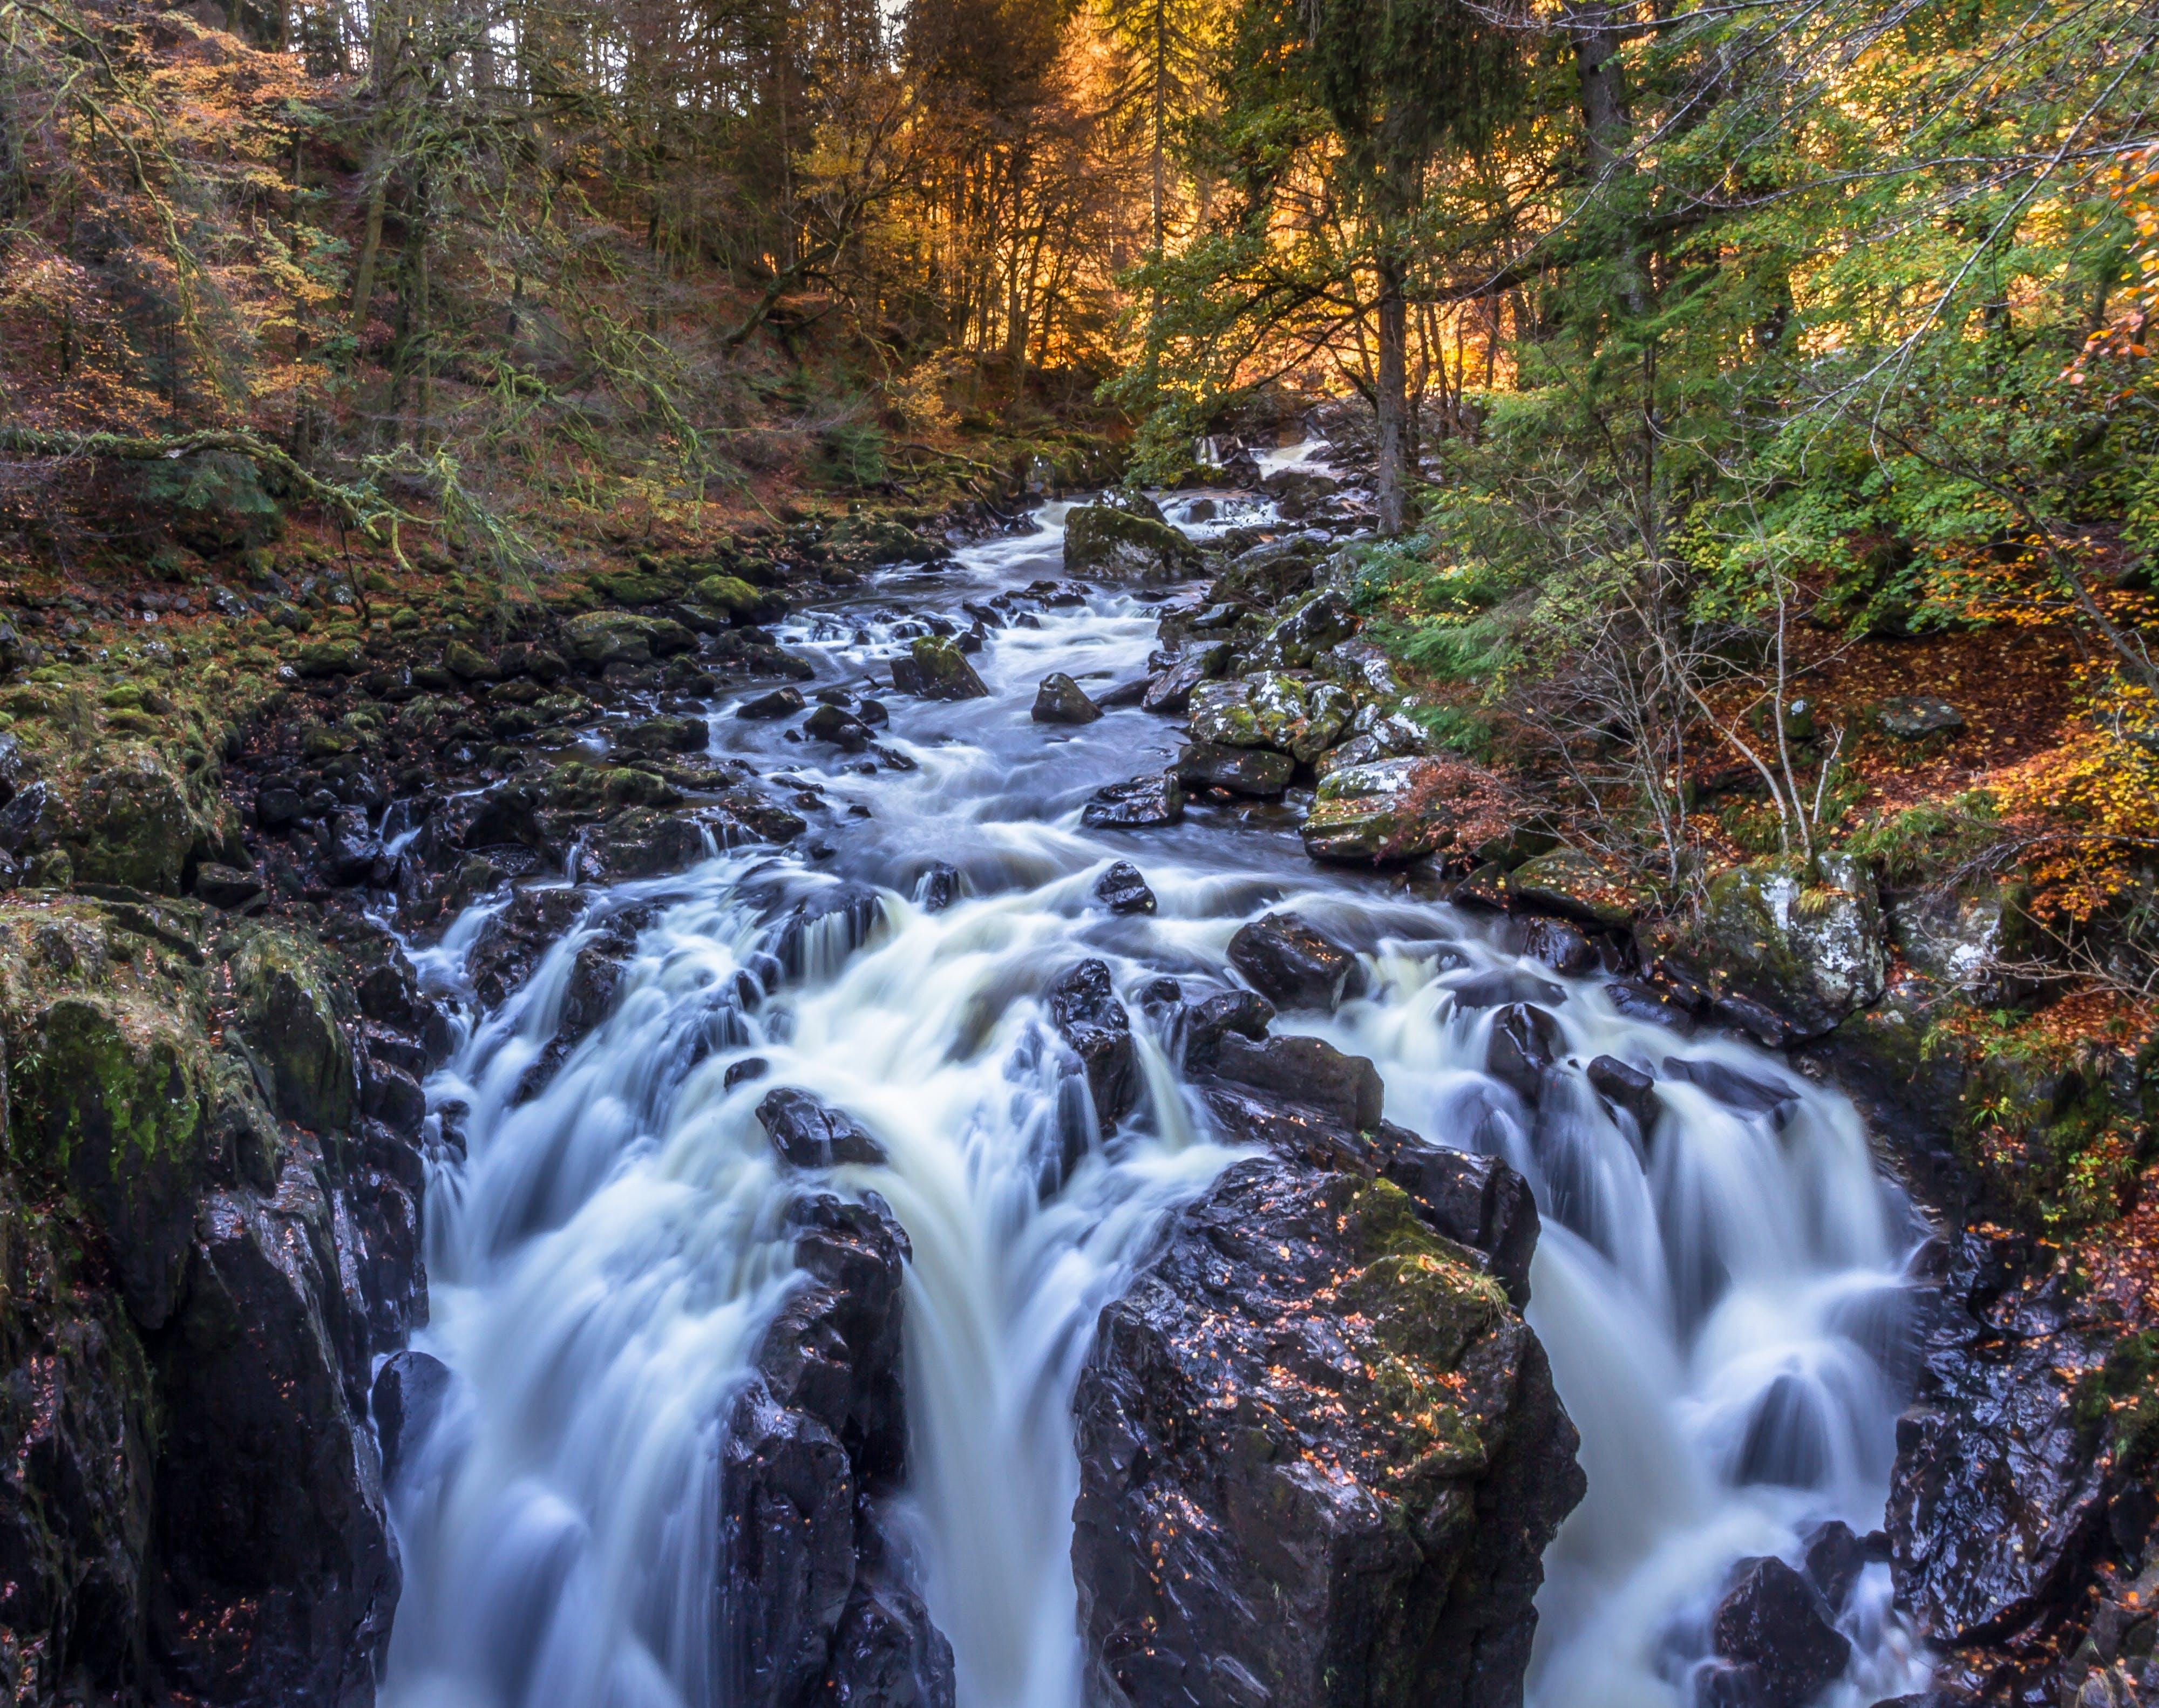 Time Lapse Landscape Photo of River